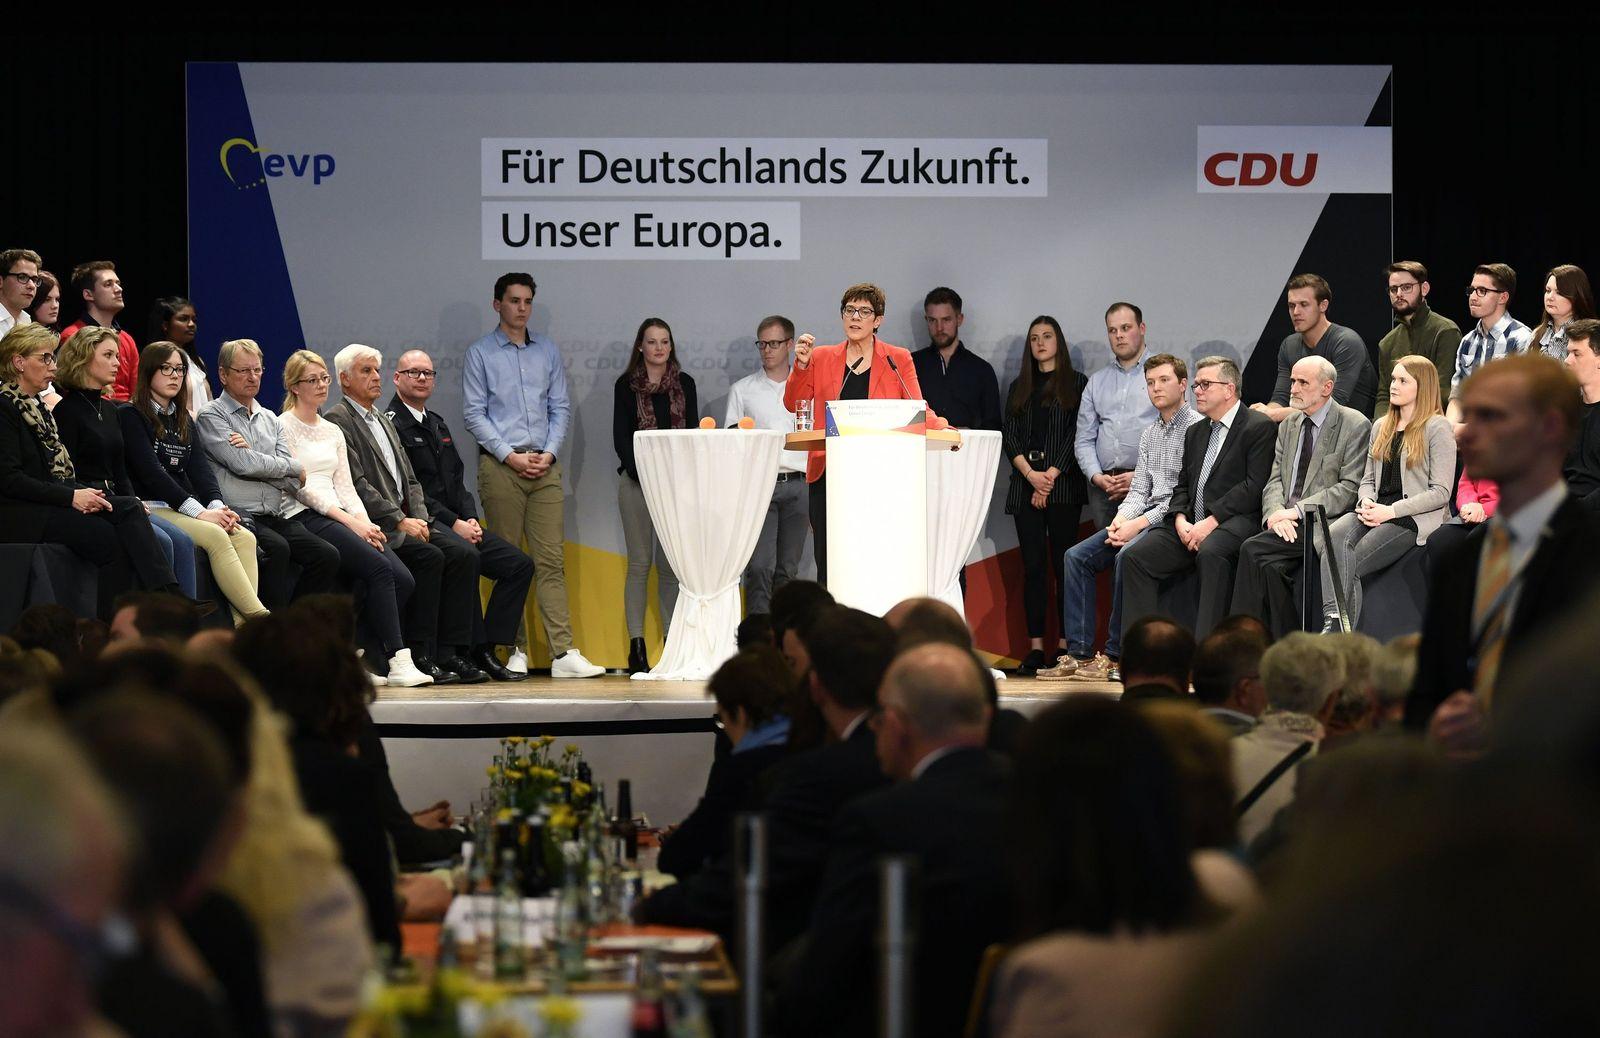 CDU Europawahlkampf in Eslohe